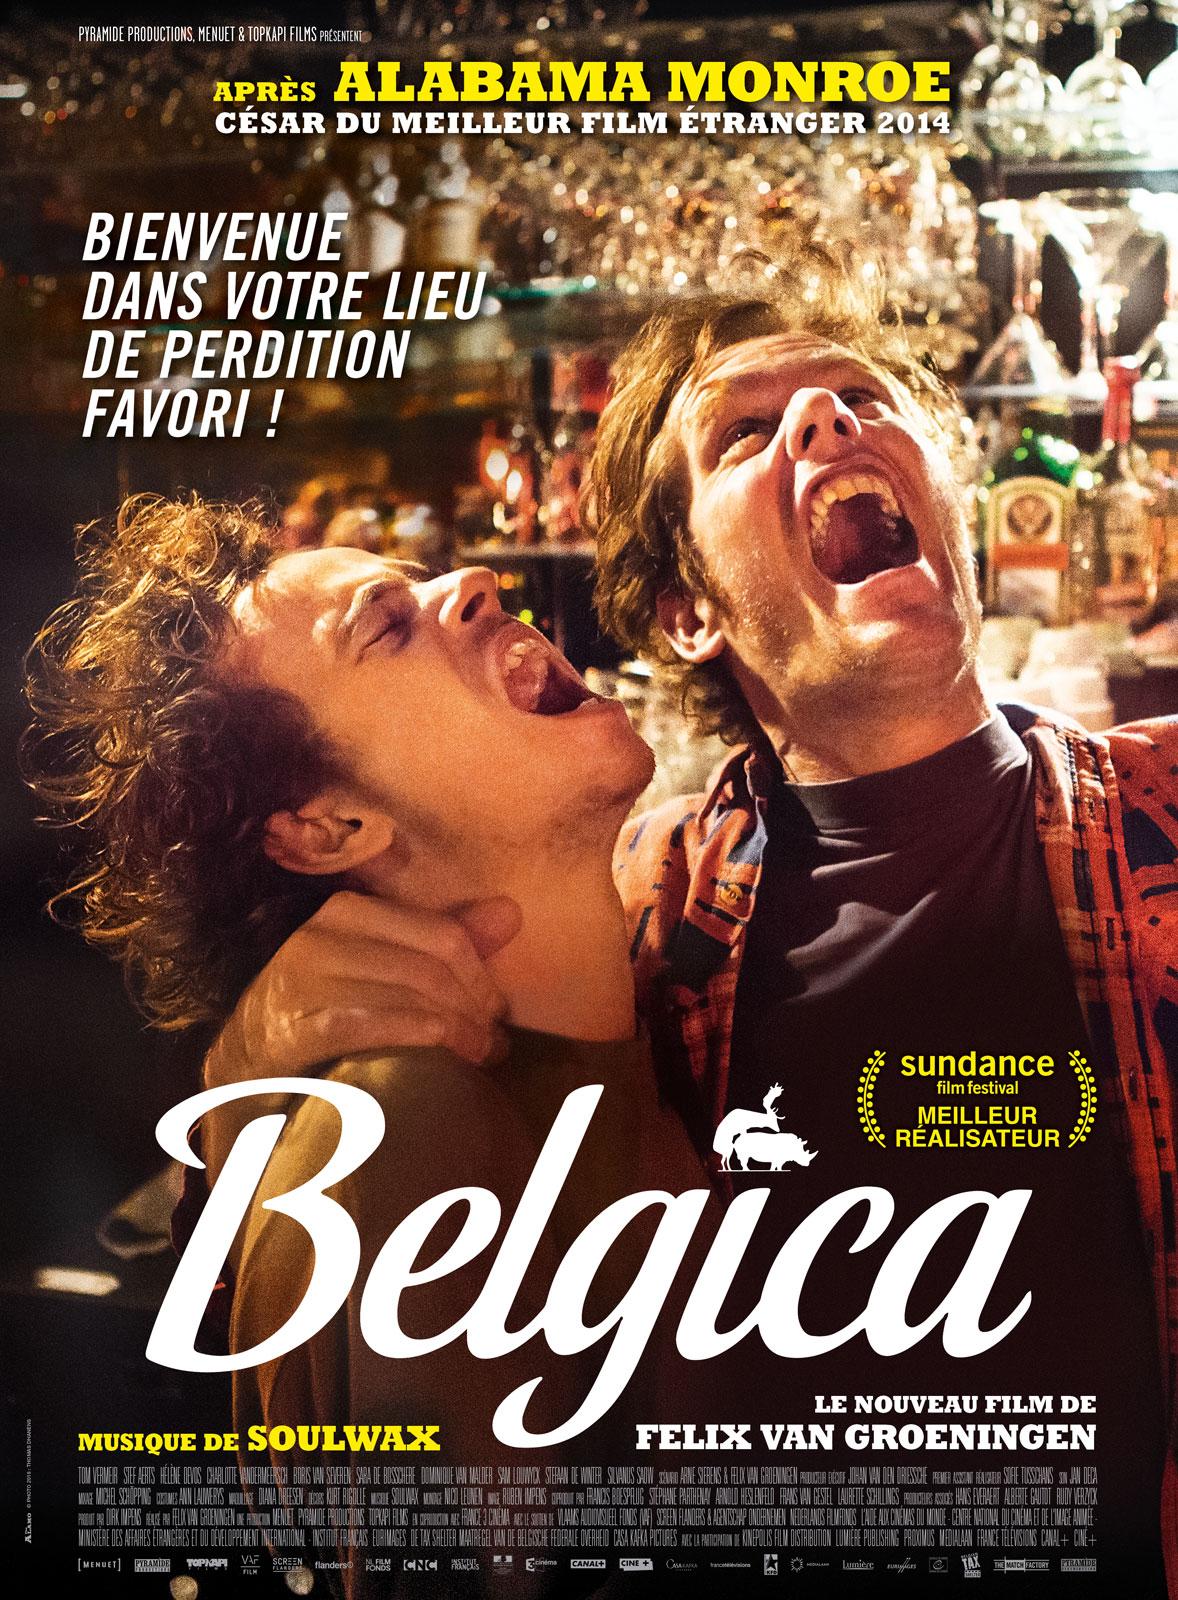 Belgica--affiche-film-belge